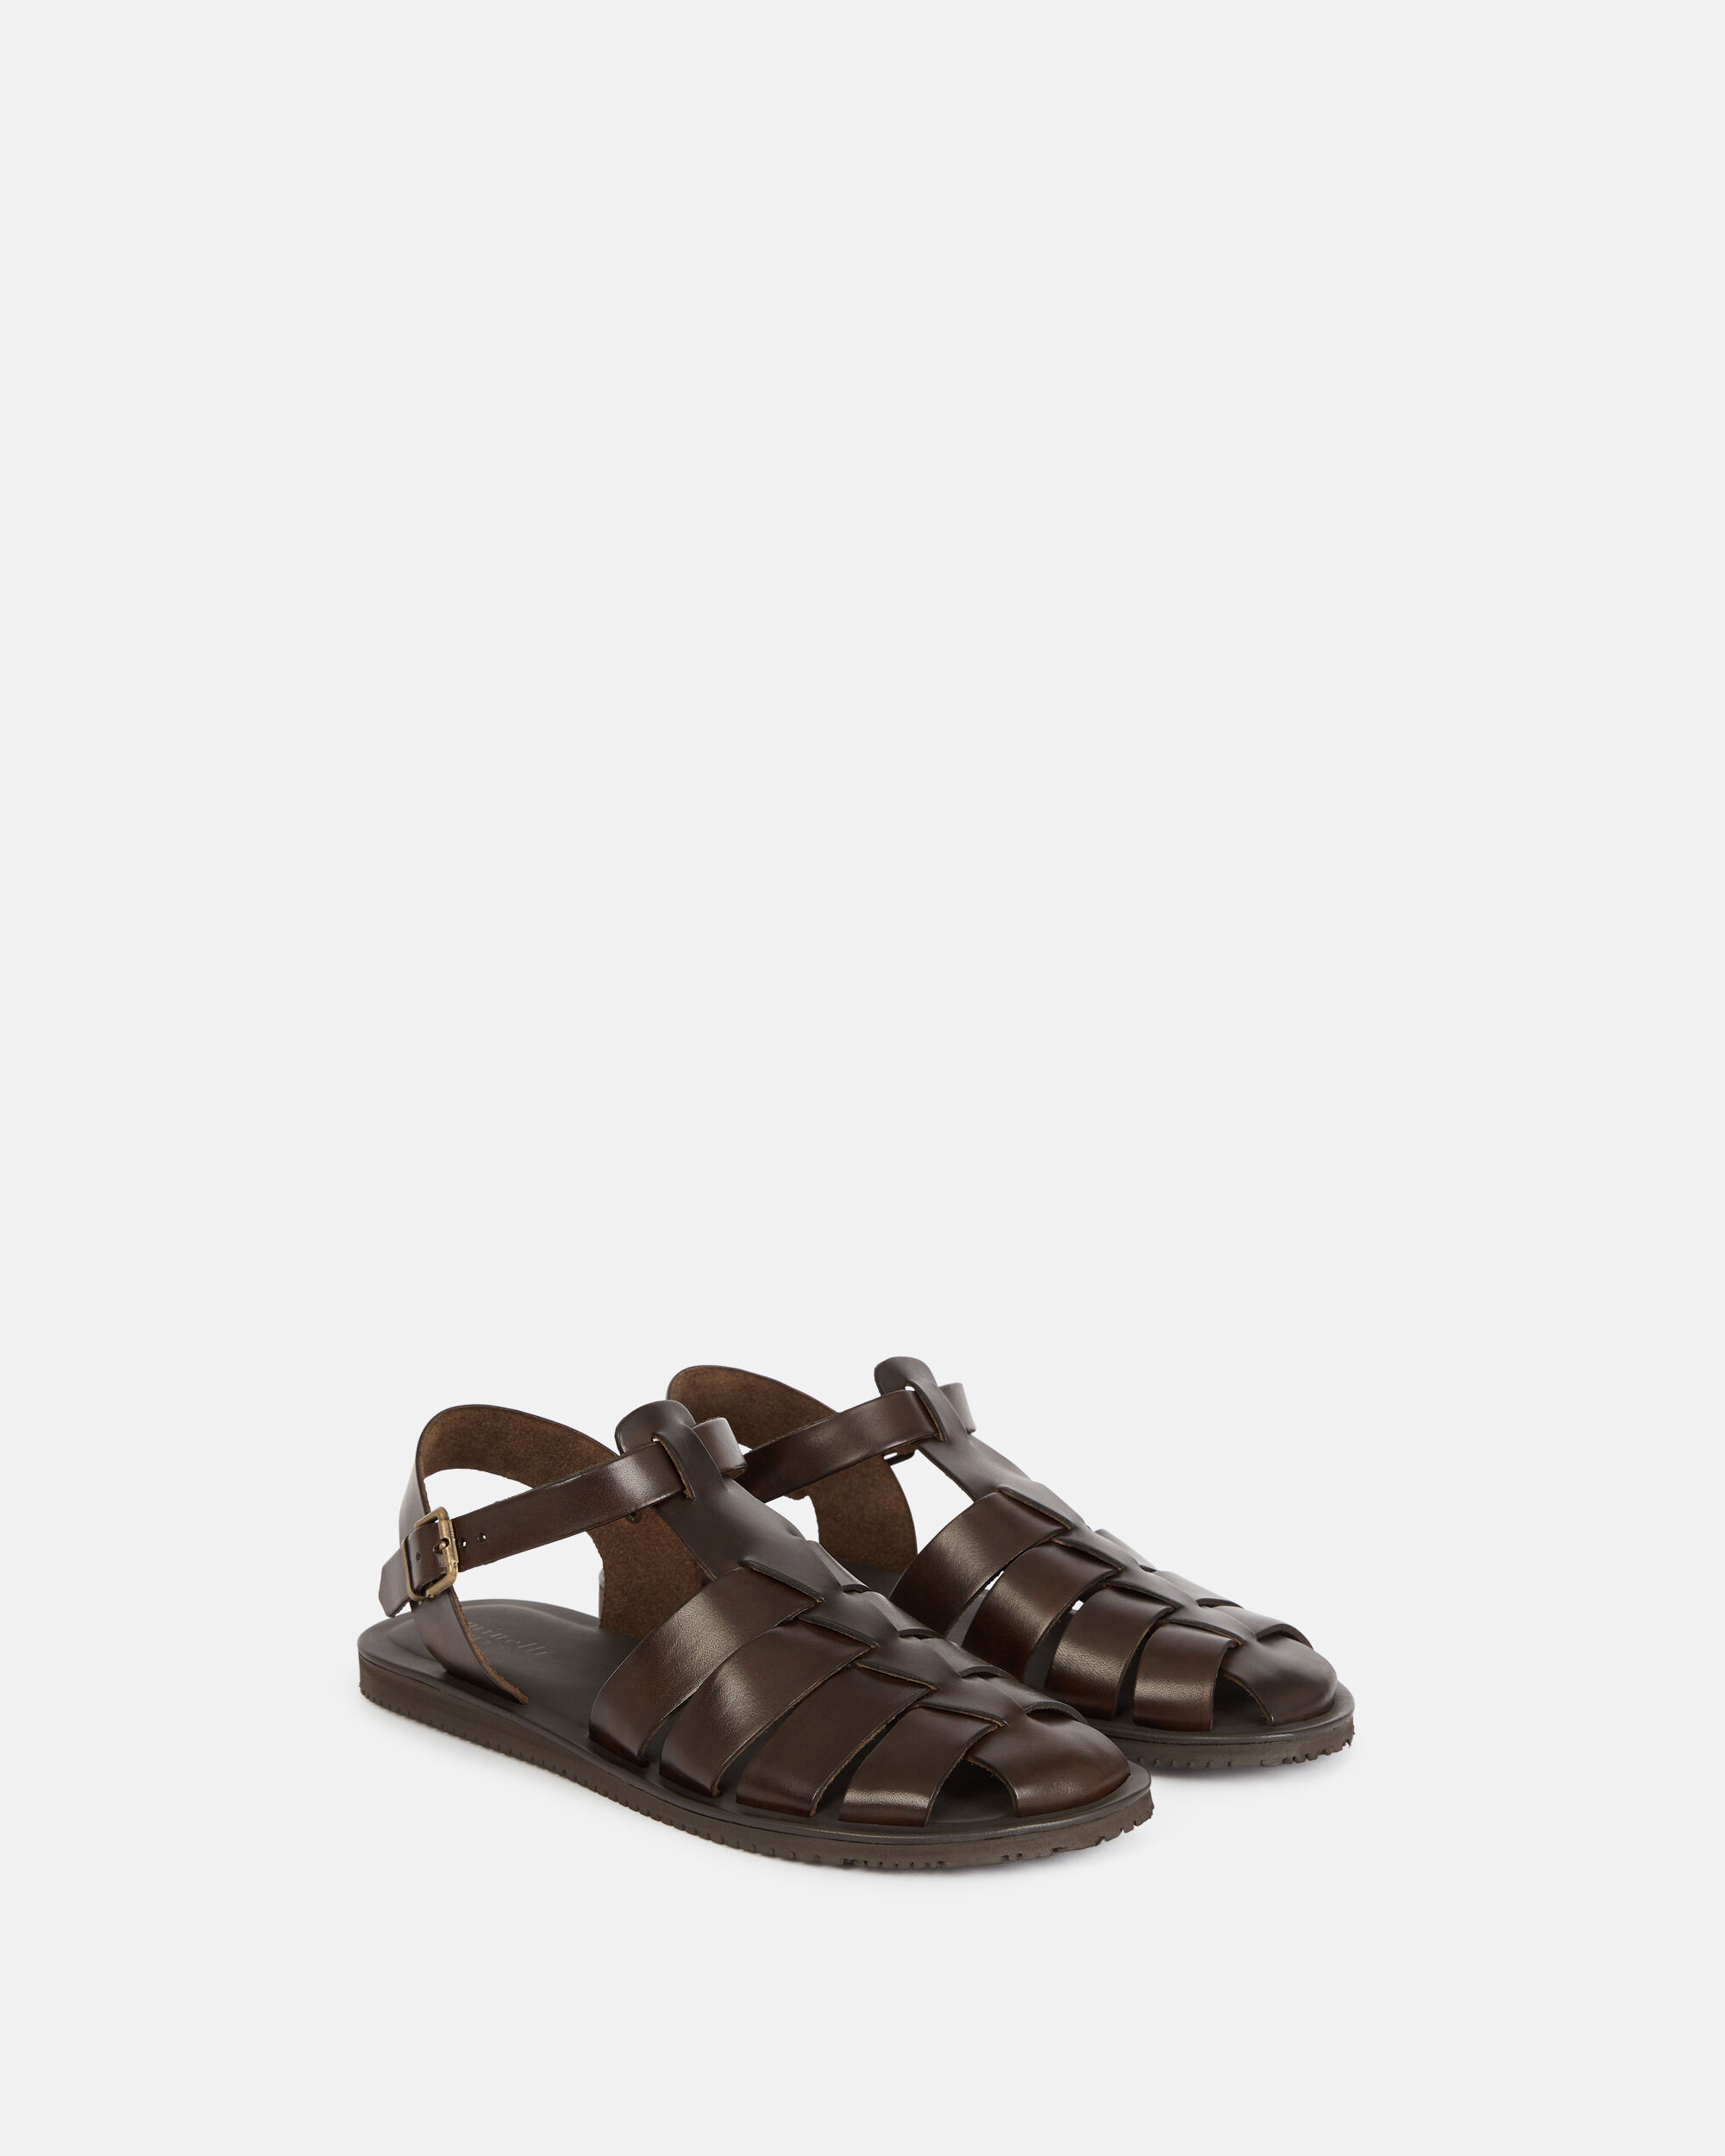 Sandales homme et chaussures nu pieds Minelli